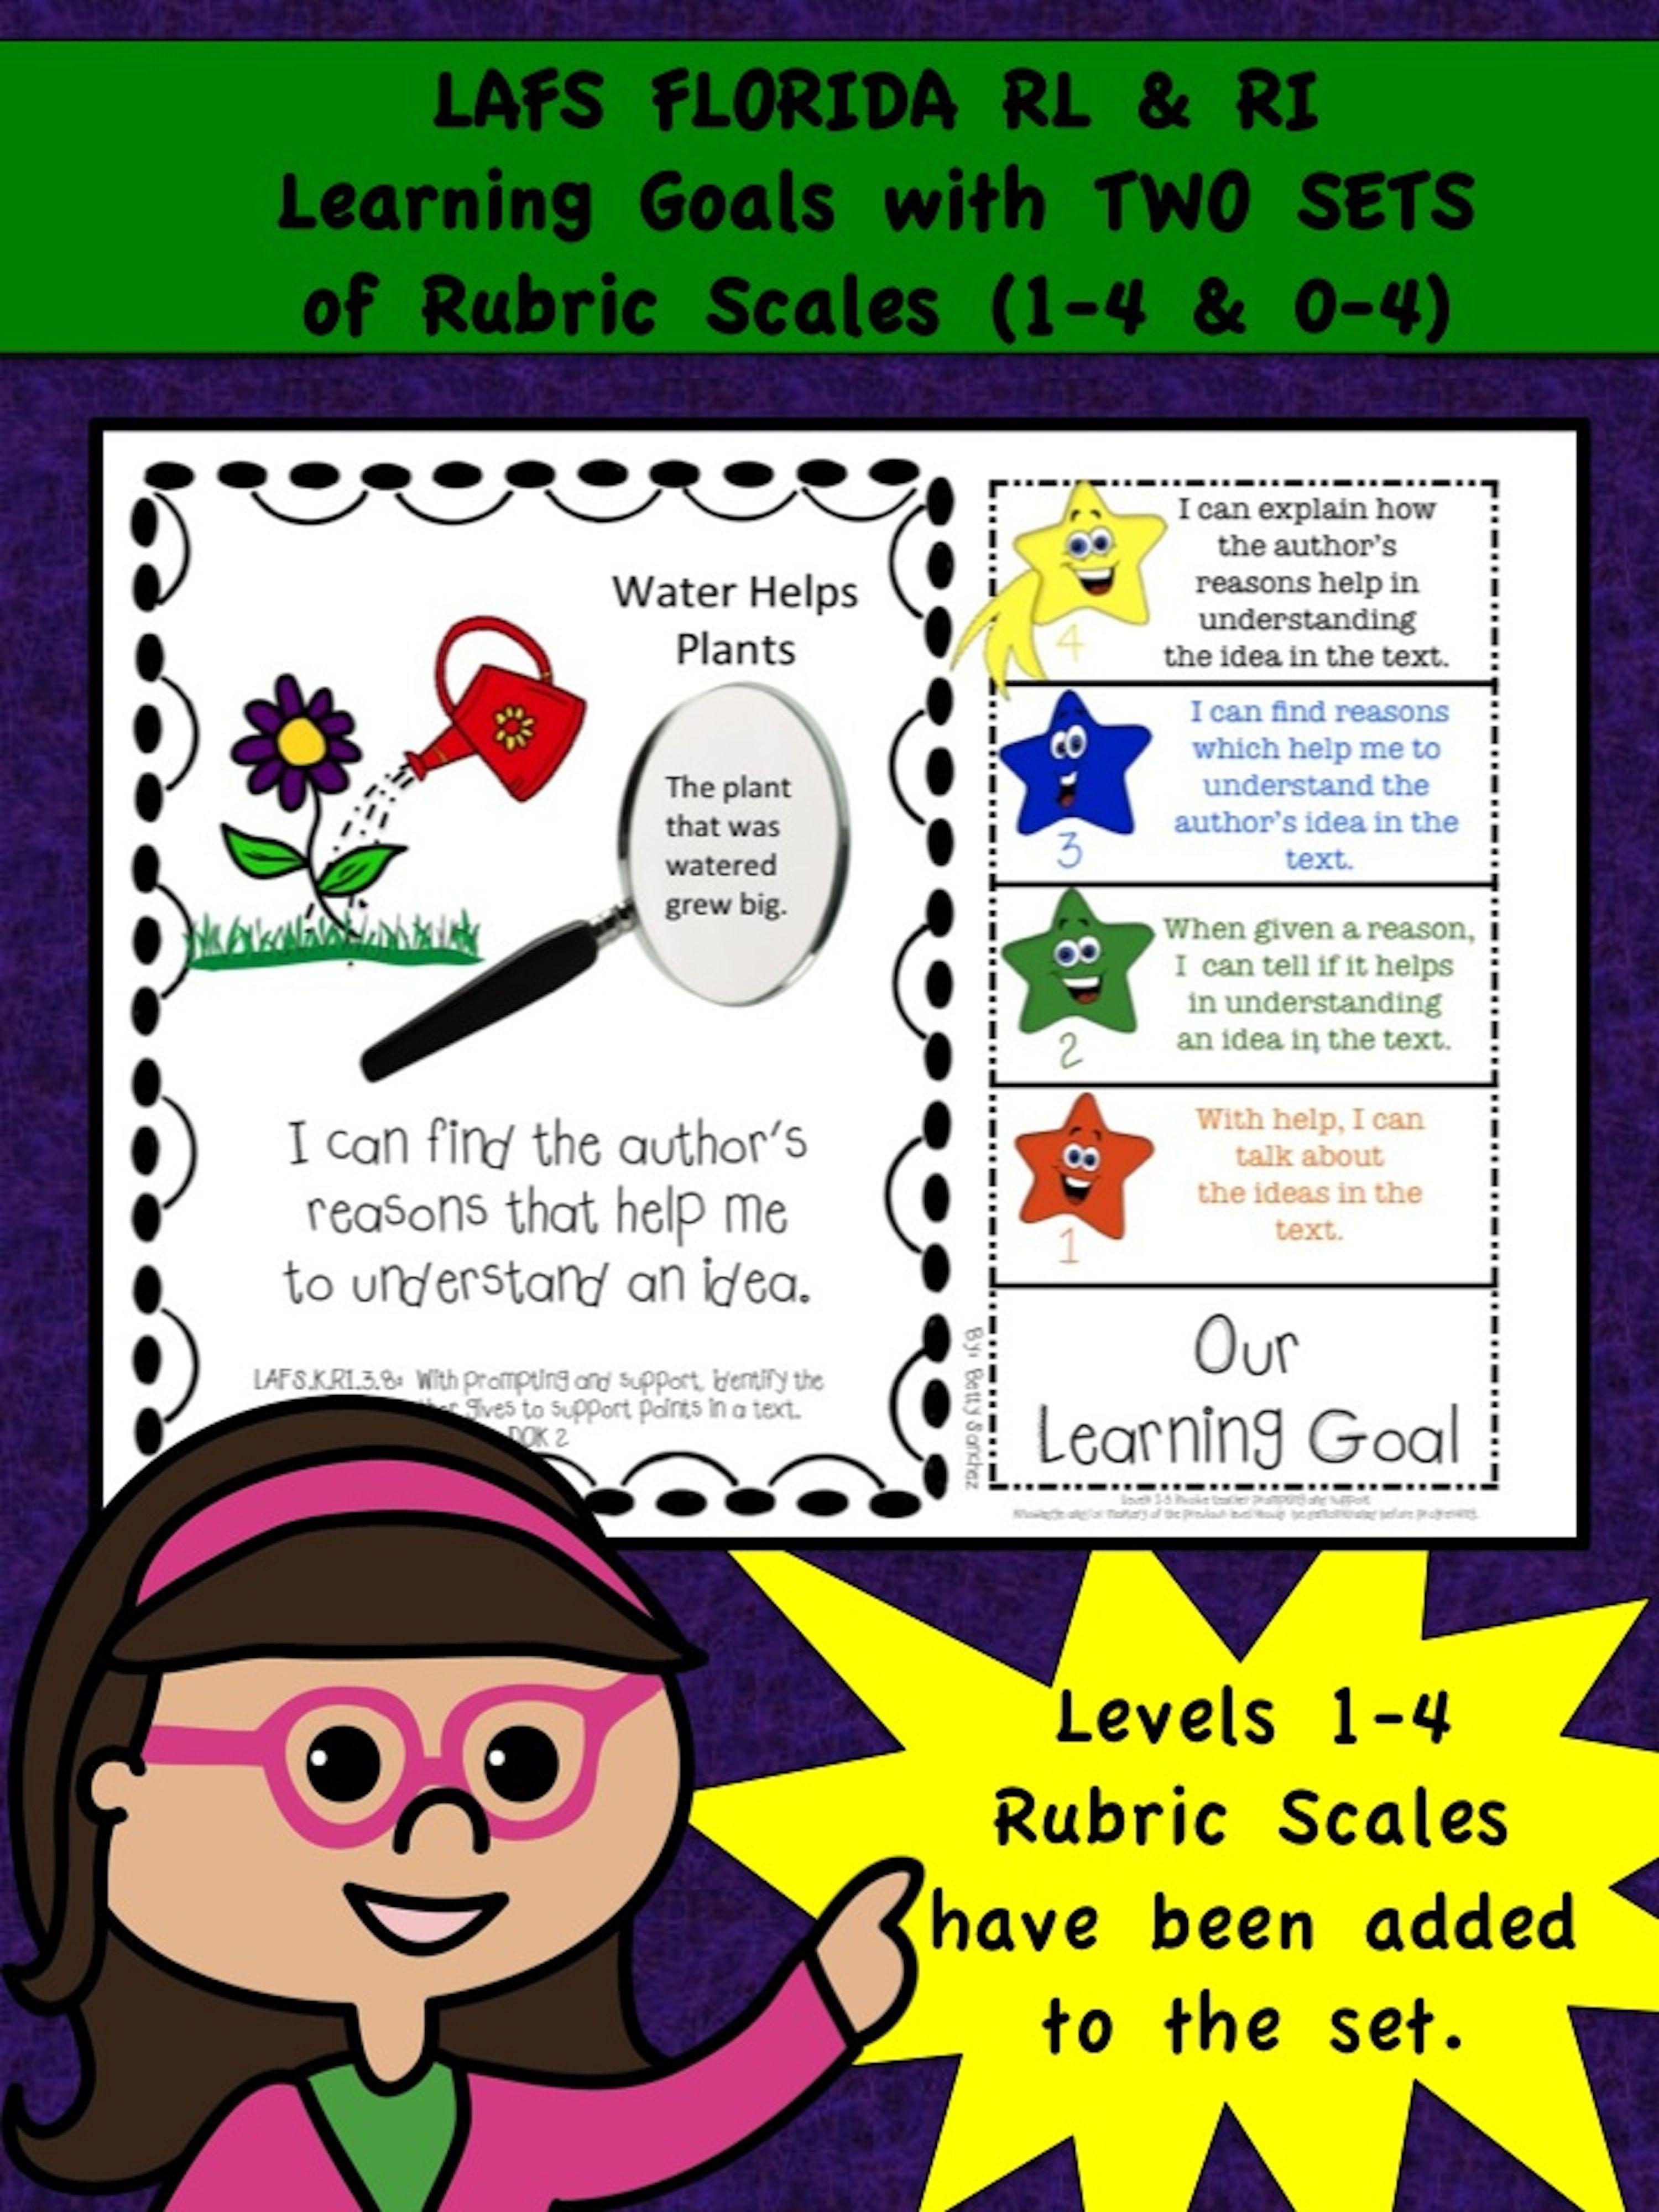 Lafs Fla Kindergarten Ri Rl Learning Goals With 2 Sets Of Rubrics Dok Levels Learning Goals Rubrics Kindergarten